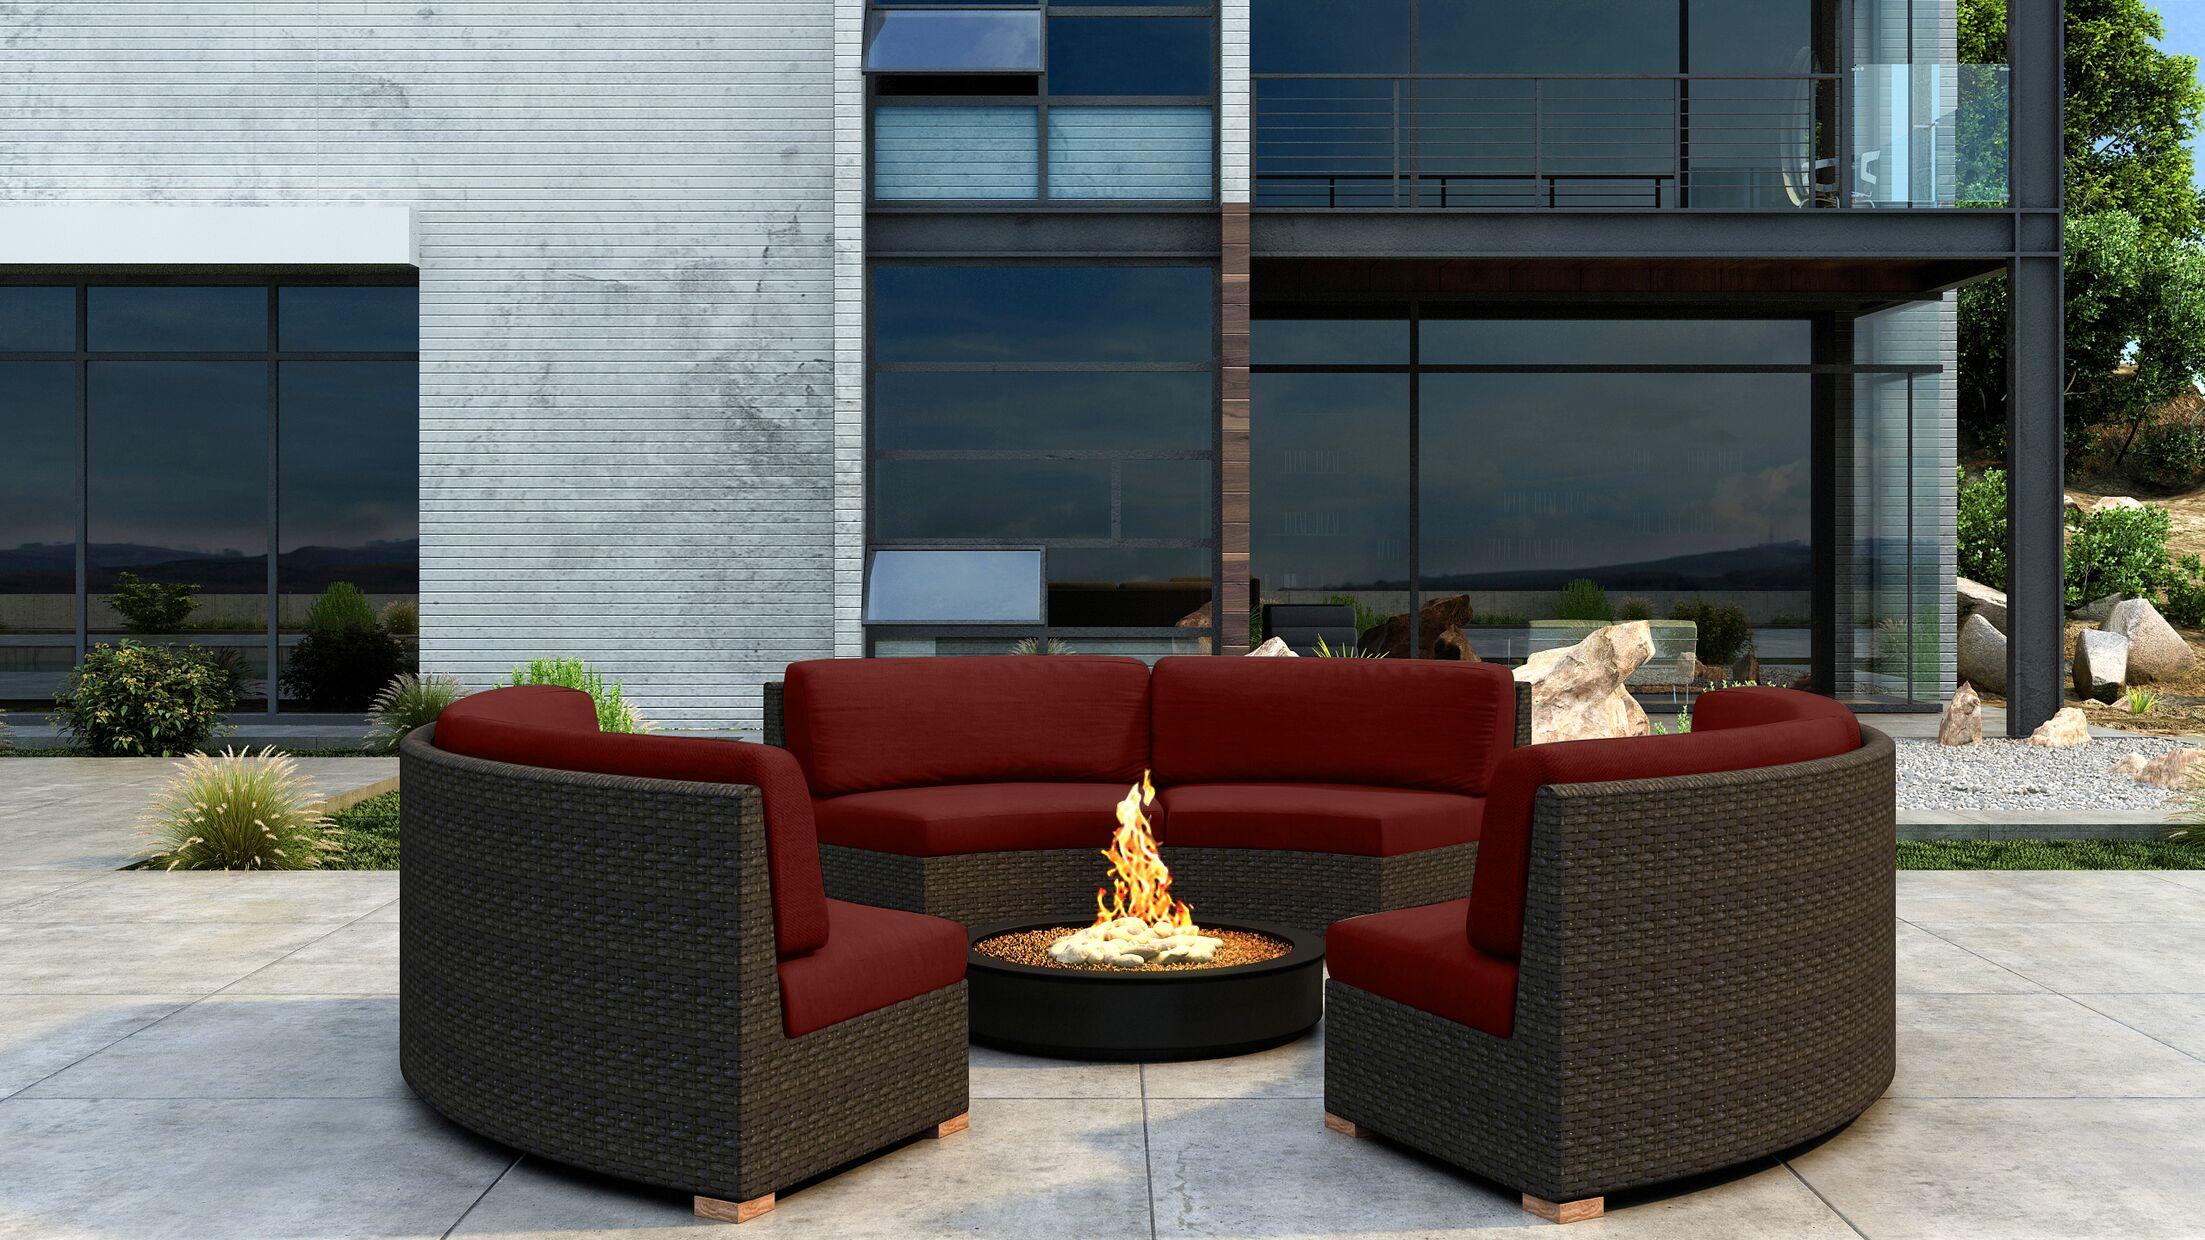 Glen Ellyn 3 Piece Sectional Set with Sunbrella Cushion Cushion Color: Canvas Henna